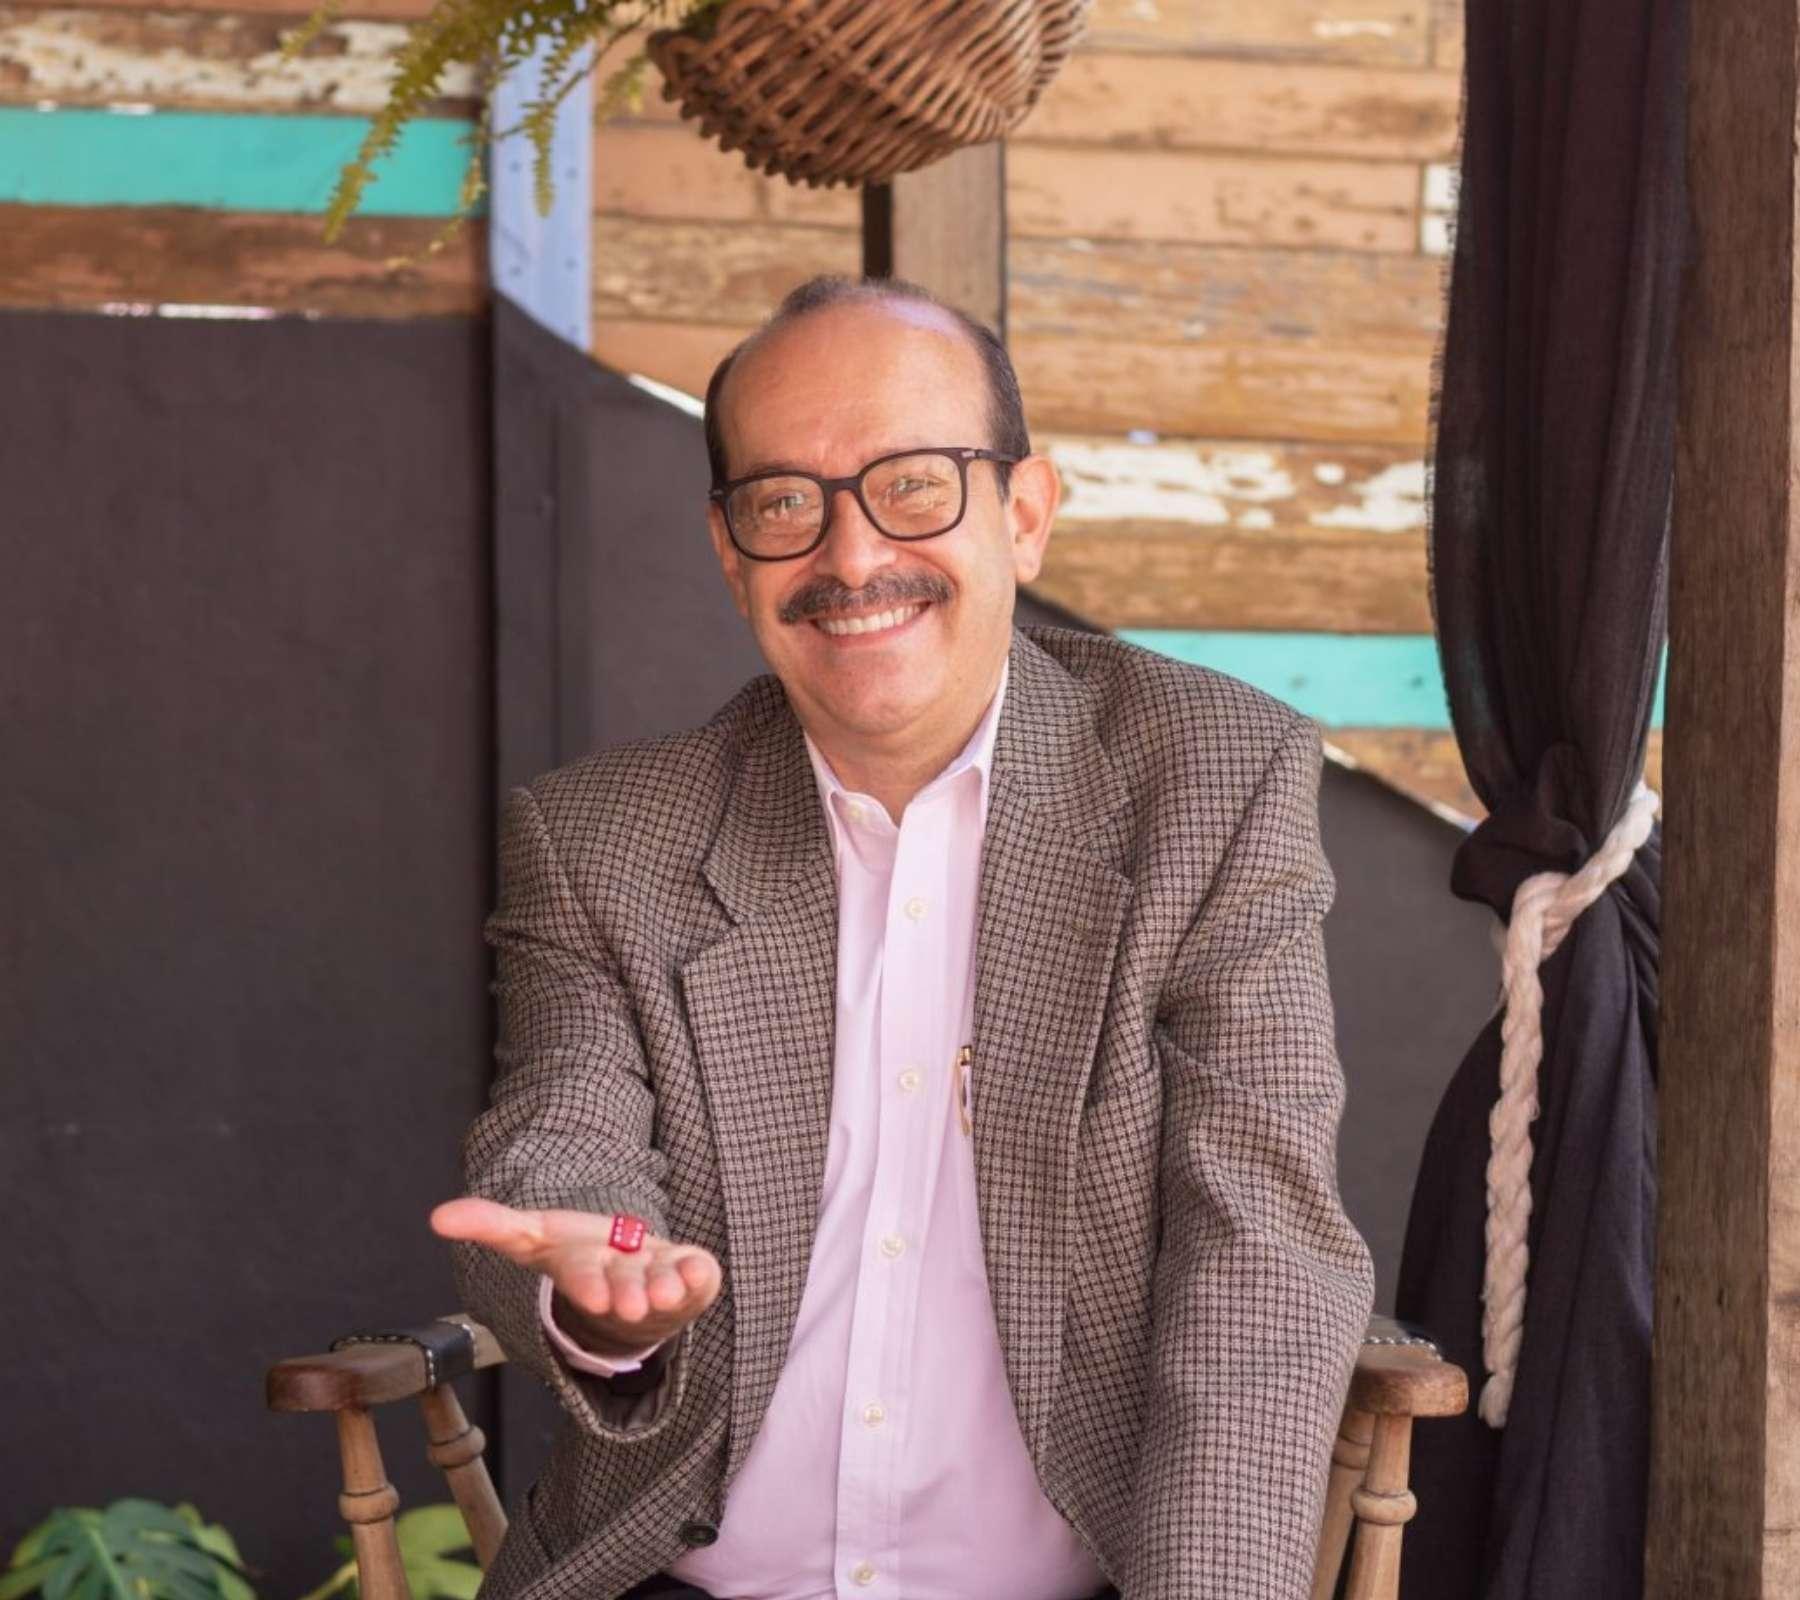 Marcos Rodríguez del castillo